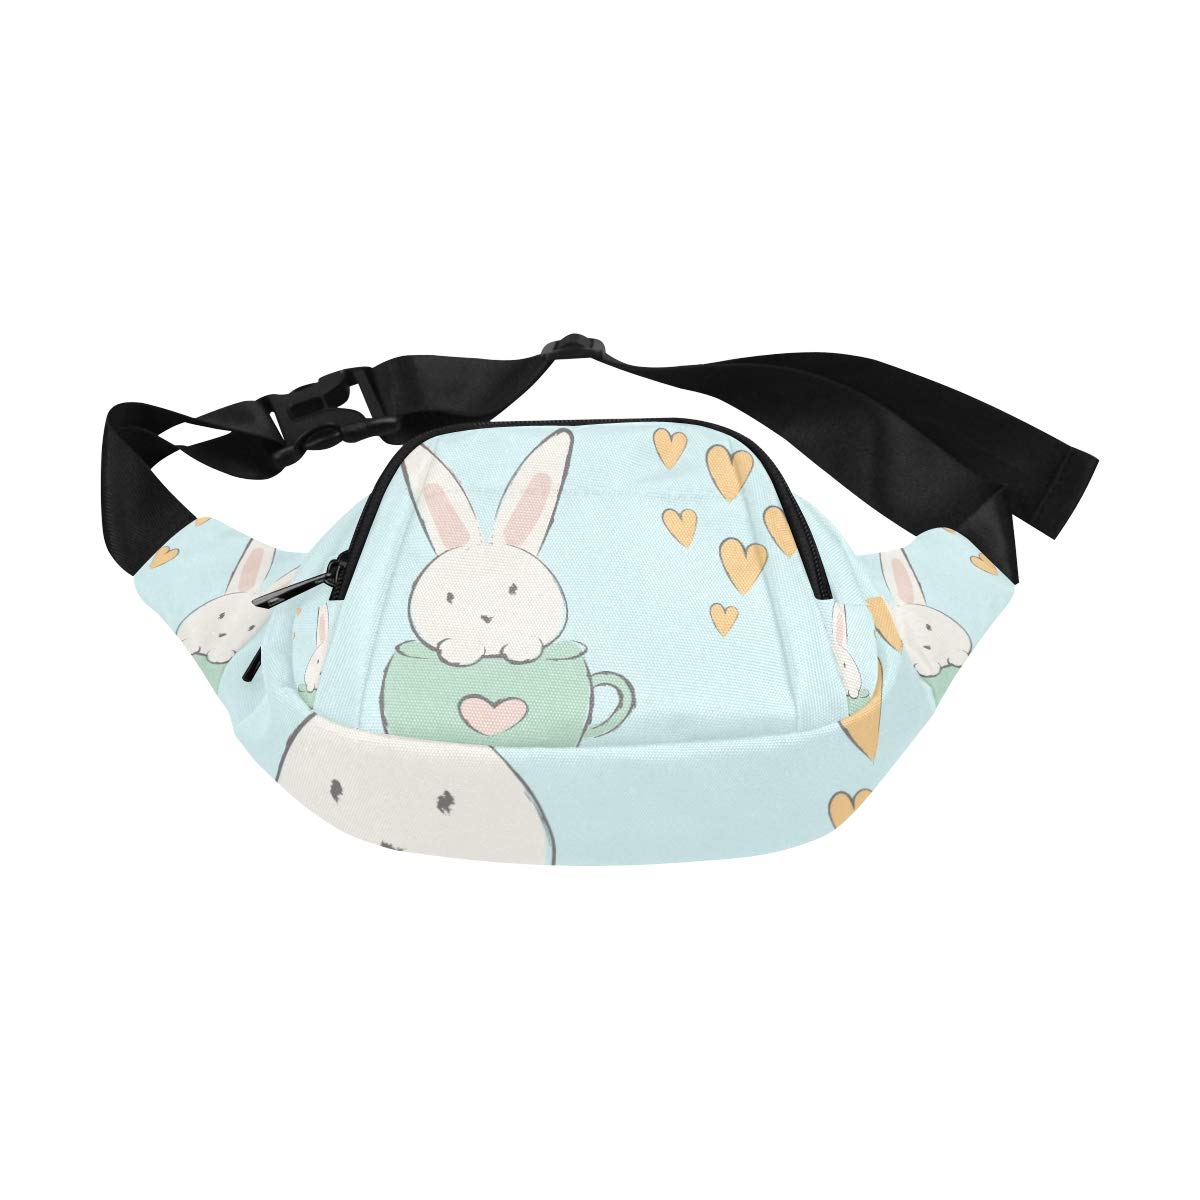 Cute Hand Drawn Bunnies In A Cup Fenny Packs Waist Bags Adjustable Belt Waterproof Nylon Travel Running Sport Vacation Party For Men Women Boys Girls Kids